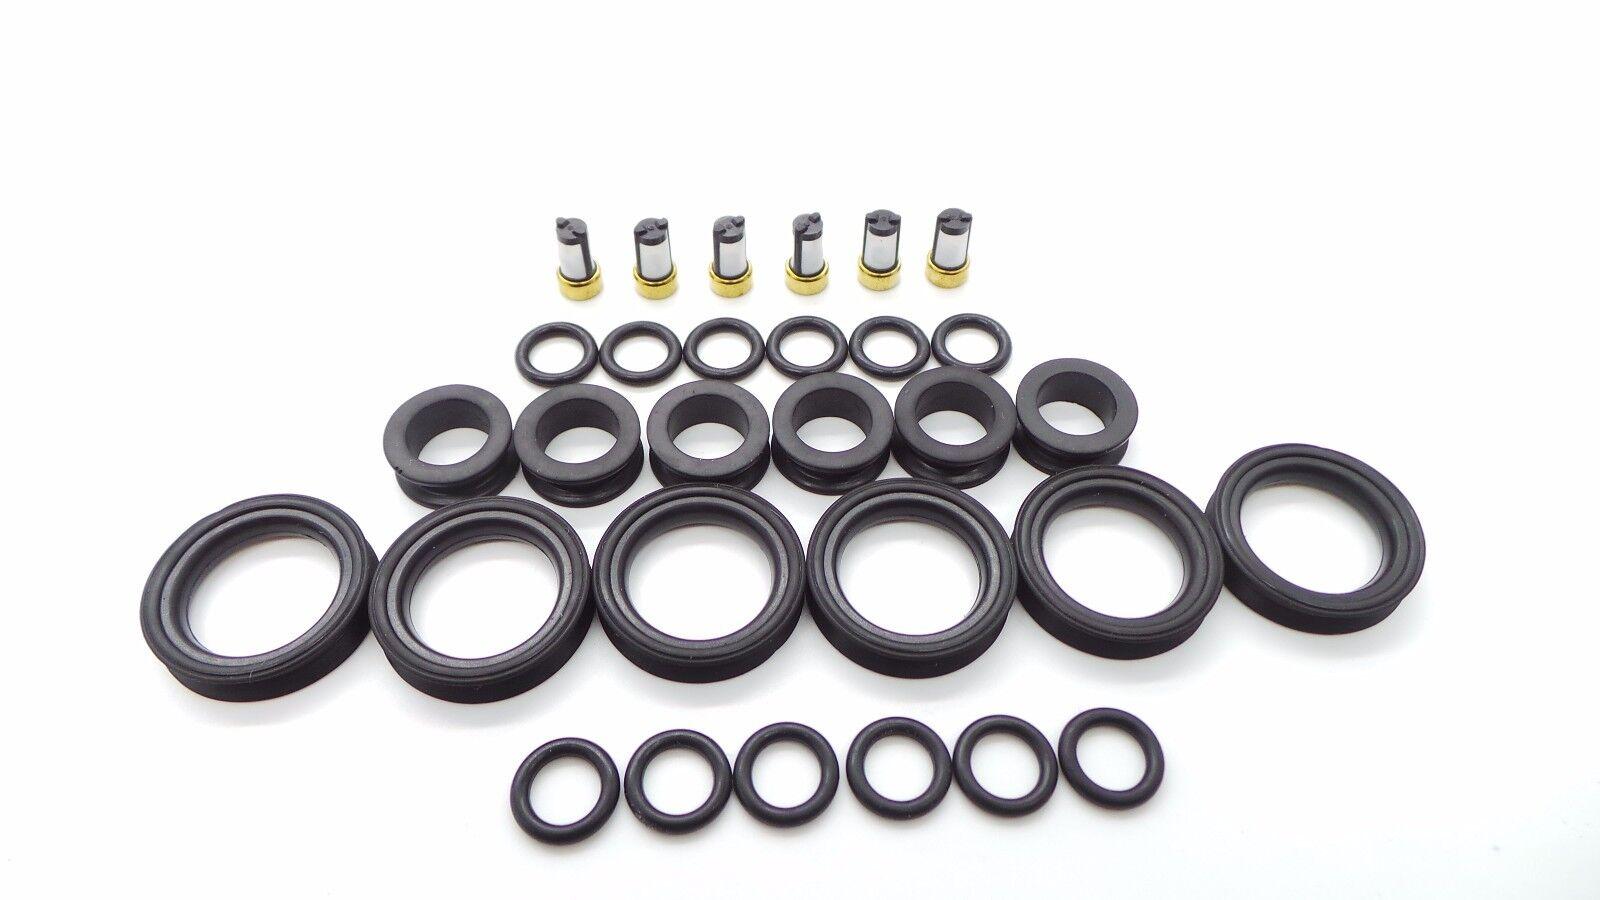 Toyota Lexus V6 Fuel Injector Repair Kit O Rings Grommets